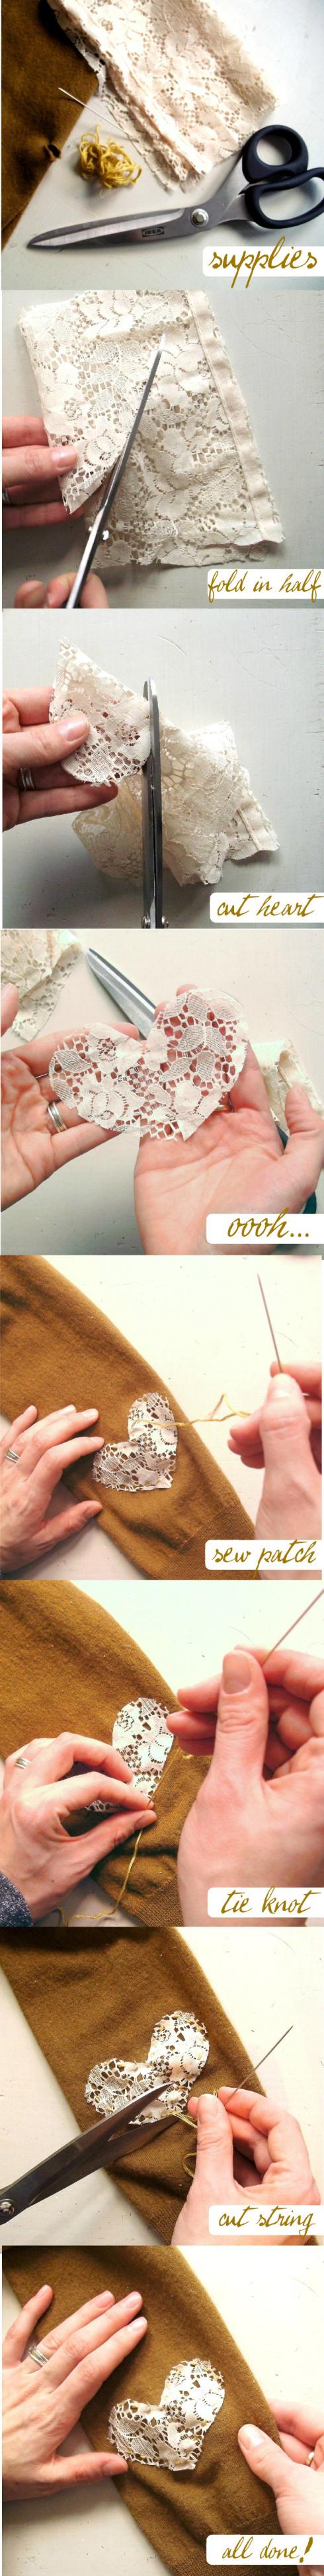 DIY Love Patch